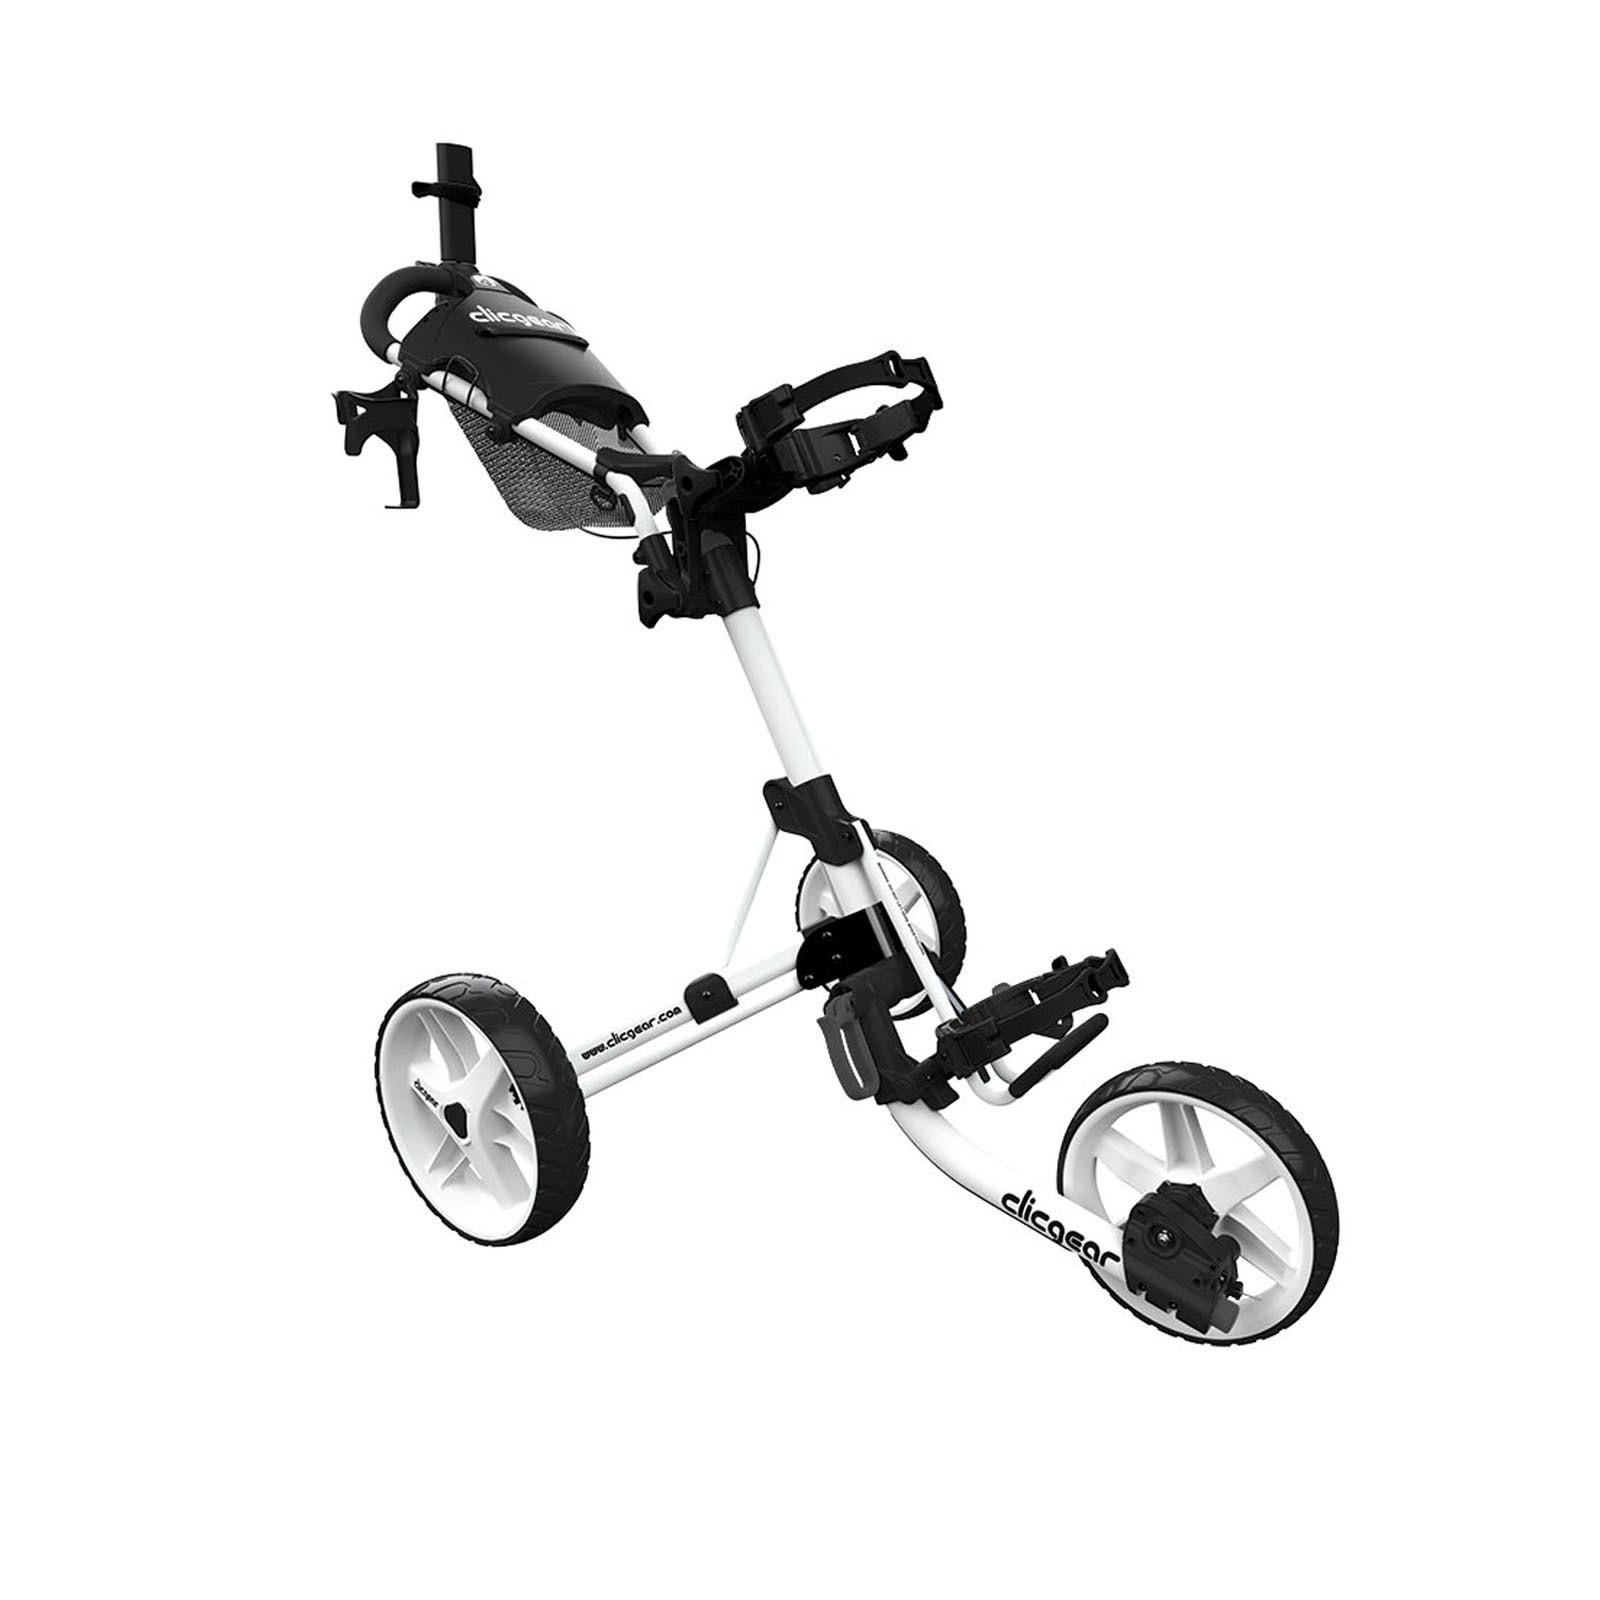 Clicgear Model 4.0 3 Wheel Push Trolley